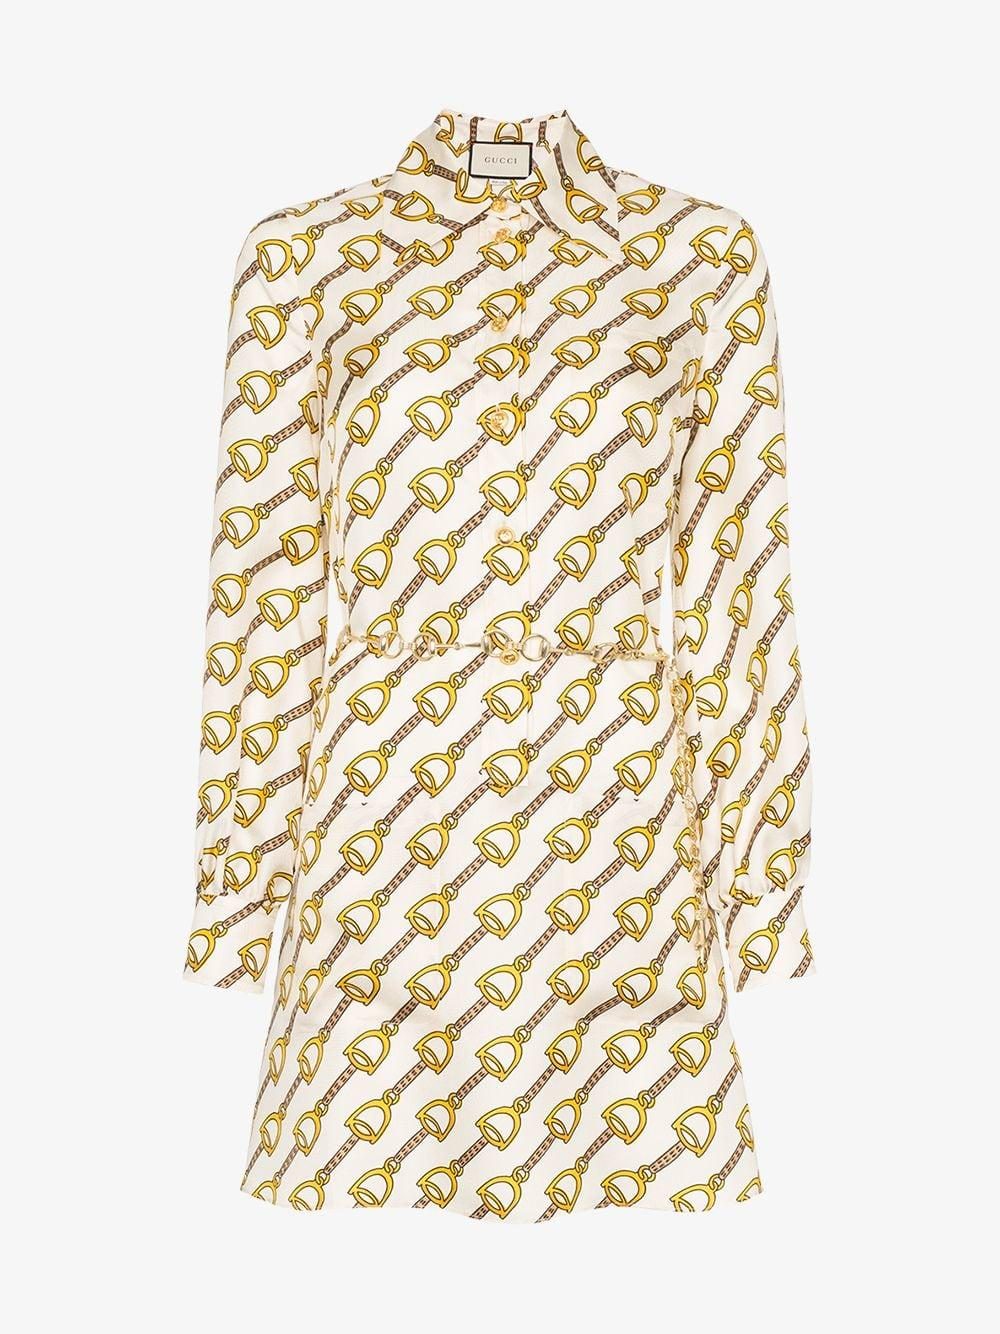 53b29082b Gucci Silk Dress With Stirrups Print in Natural - Lyst